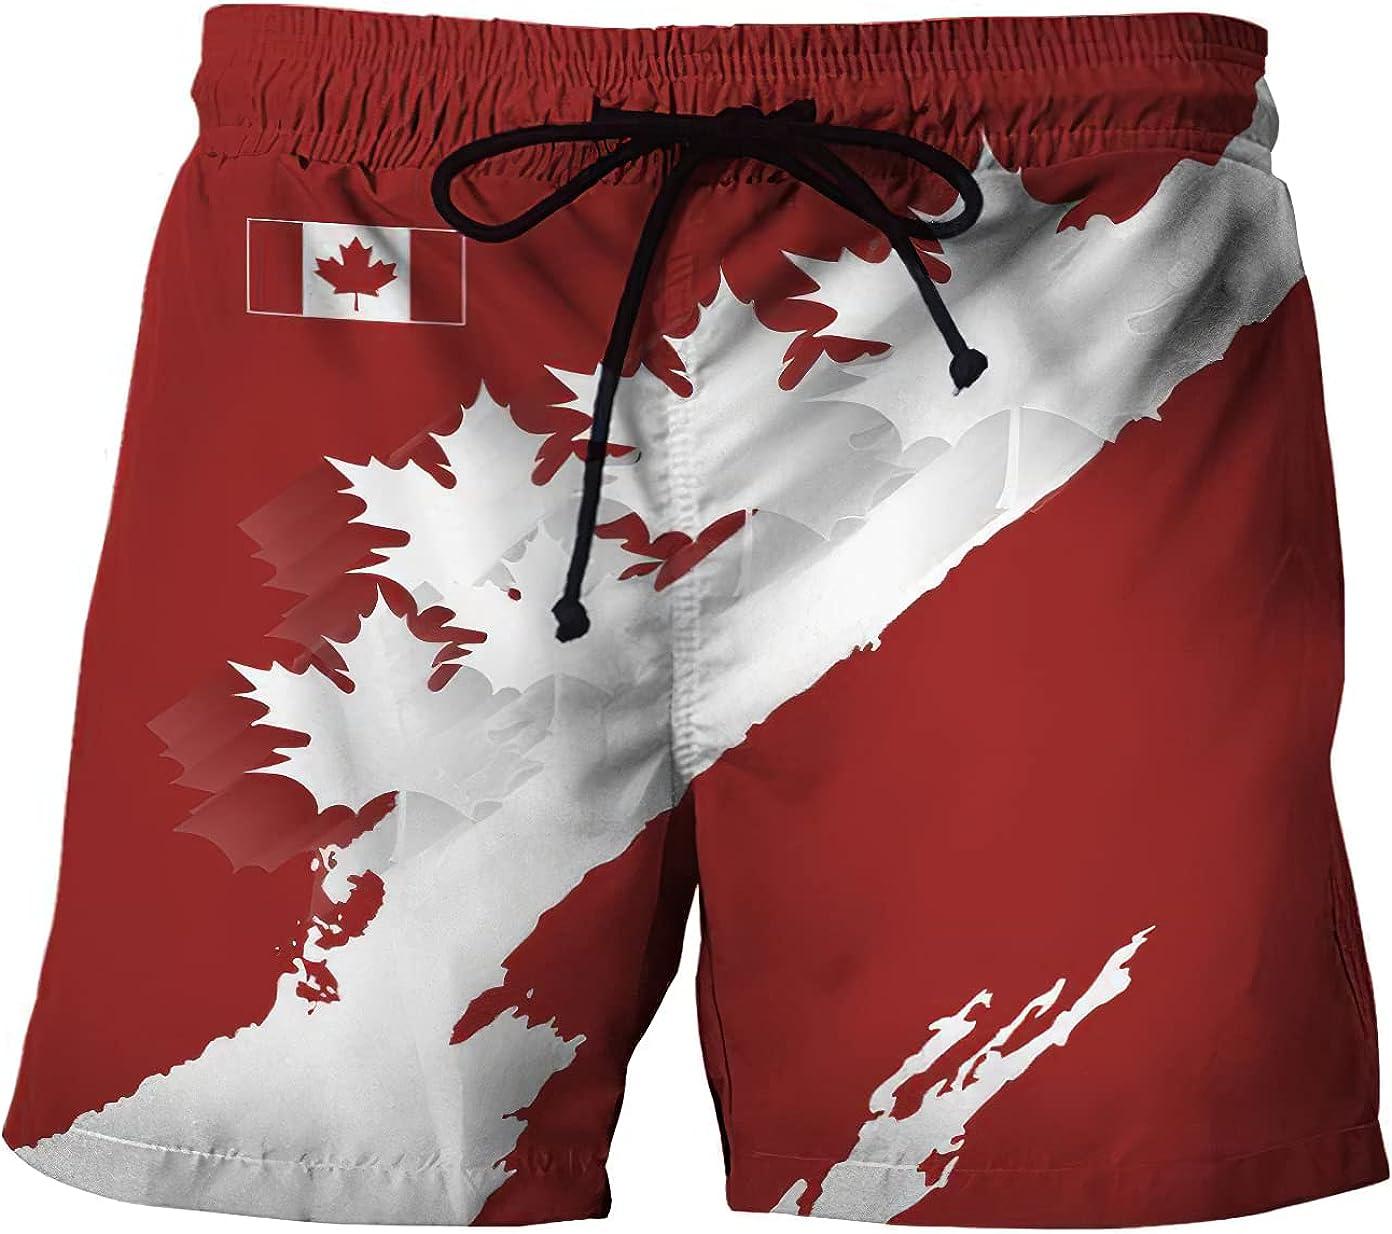 Canadian Maple Leaf Men's Short Swim Trunks Swimming Short Quick Dry Funky Summer Beach Shorts Holiday Beachwear Swim Trouser Shorts Pants